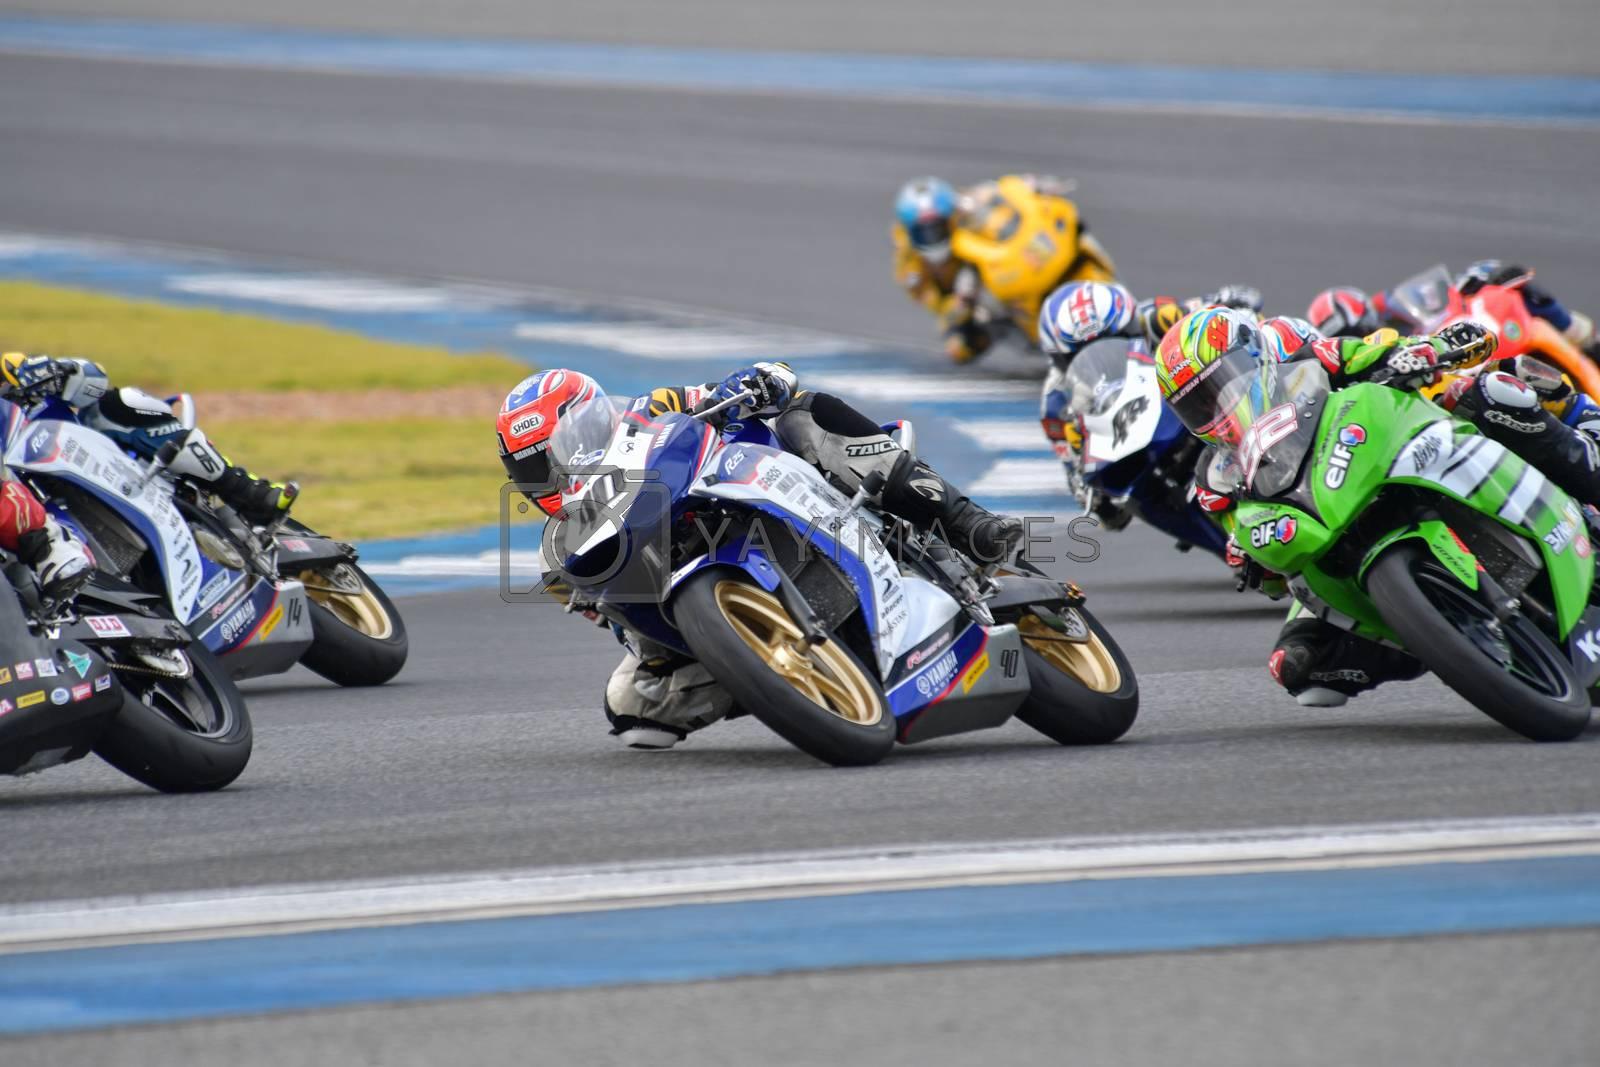 BURIRAM - DECEMBER 4 : Kanalat Jaiman of Thailand with Yamaha motorcycle of Asia Production 250cc. in Asia Road Racing Championship 2016 Round 6 at Chang International Racing Circuit on December 4, 2016, Buriram, Thailand.